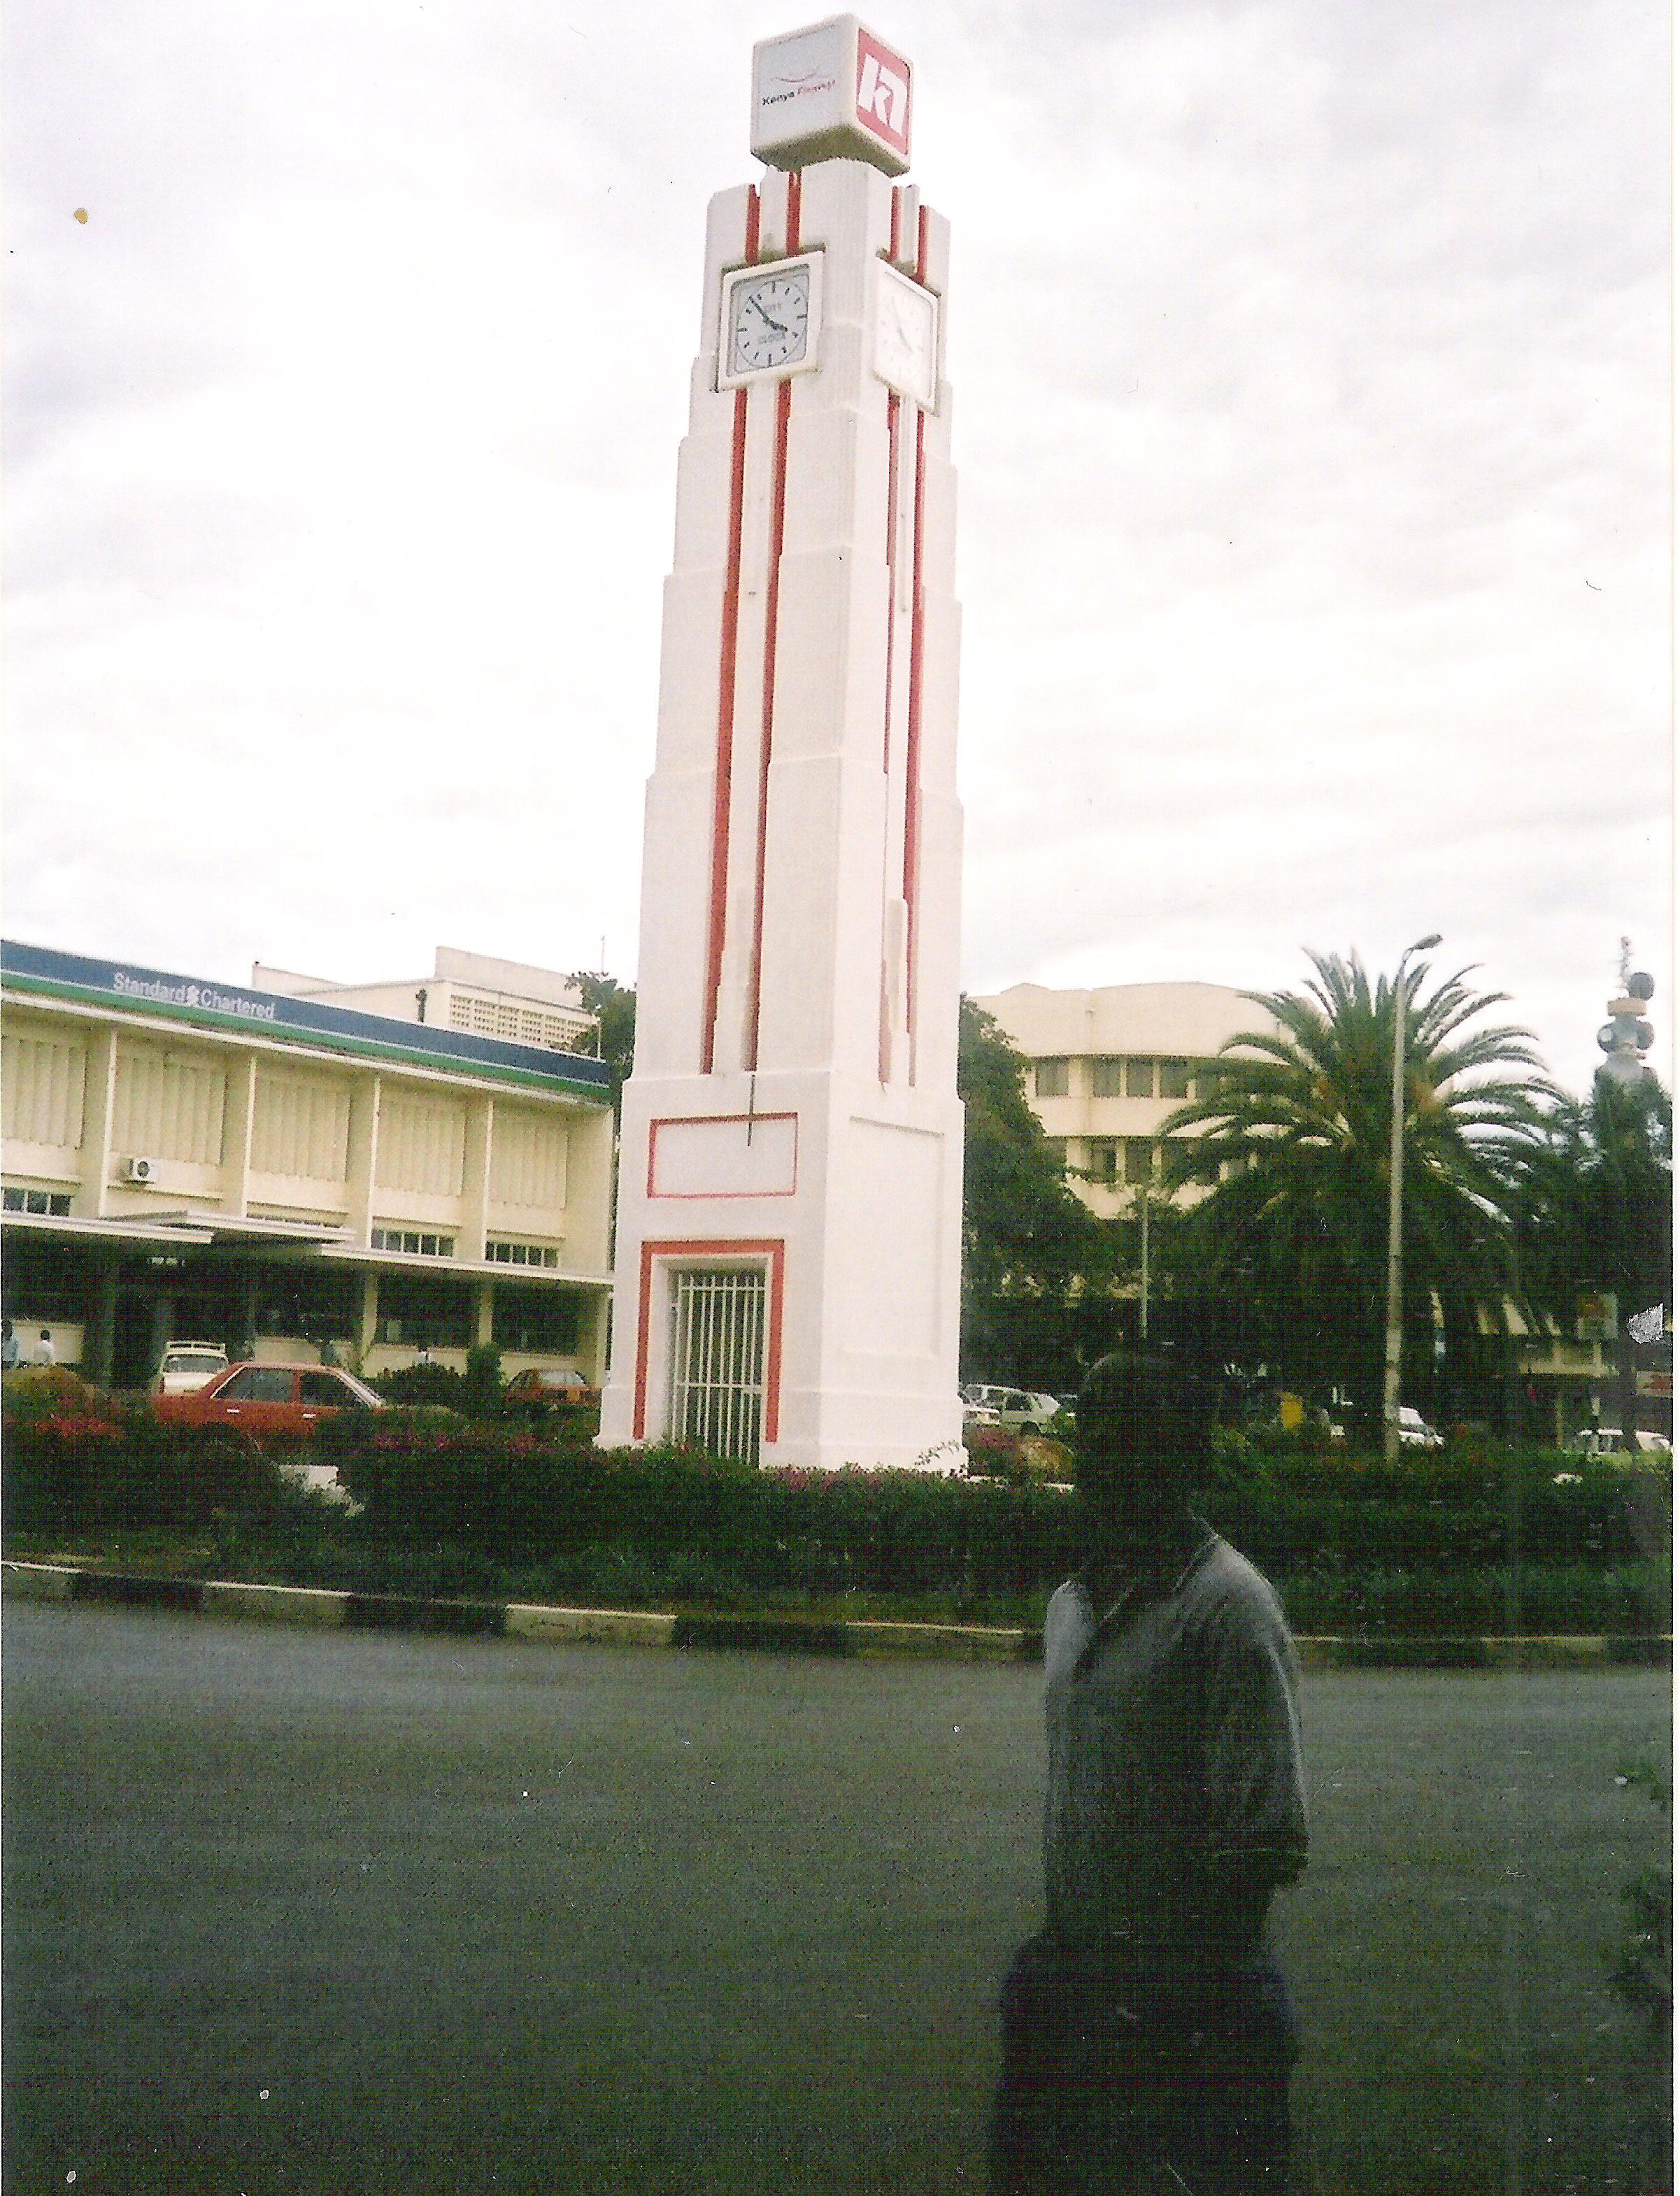 Kisumu, Kenya (from Wikipedia)